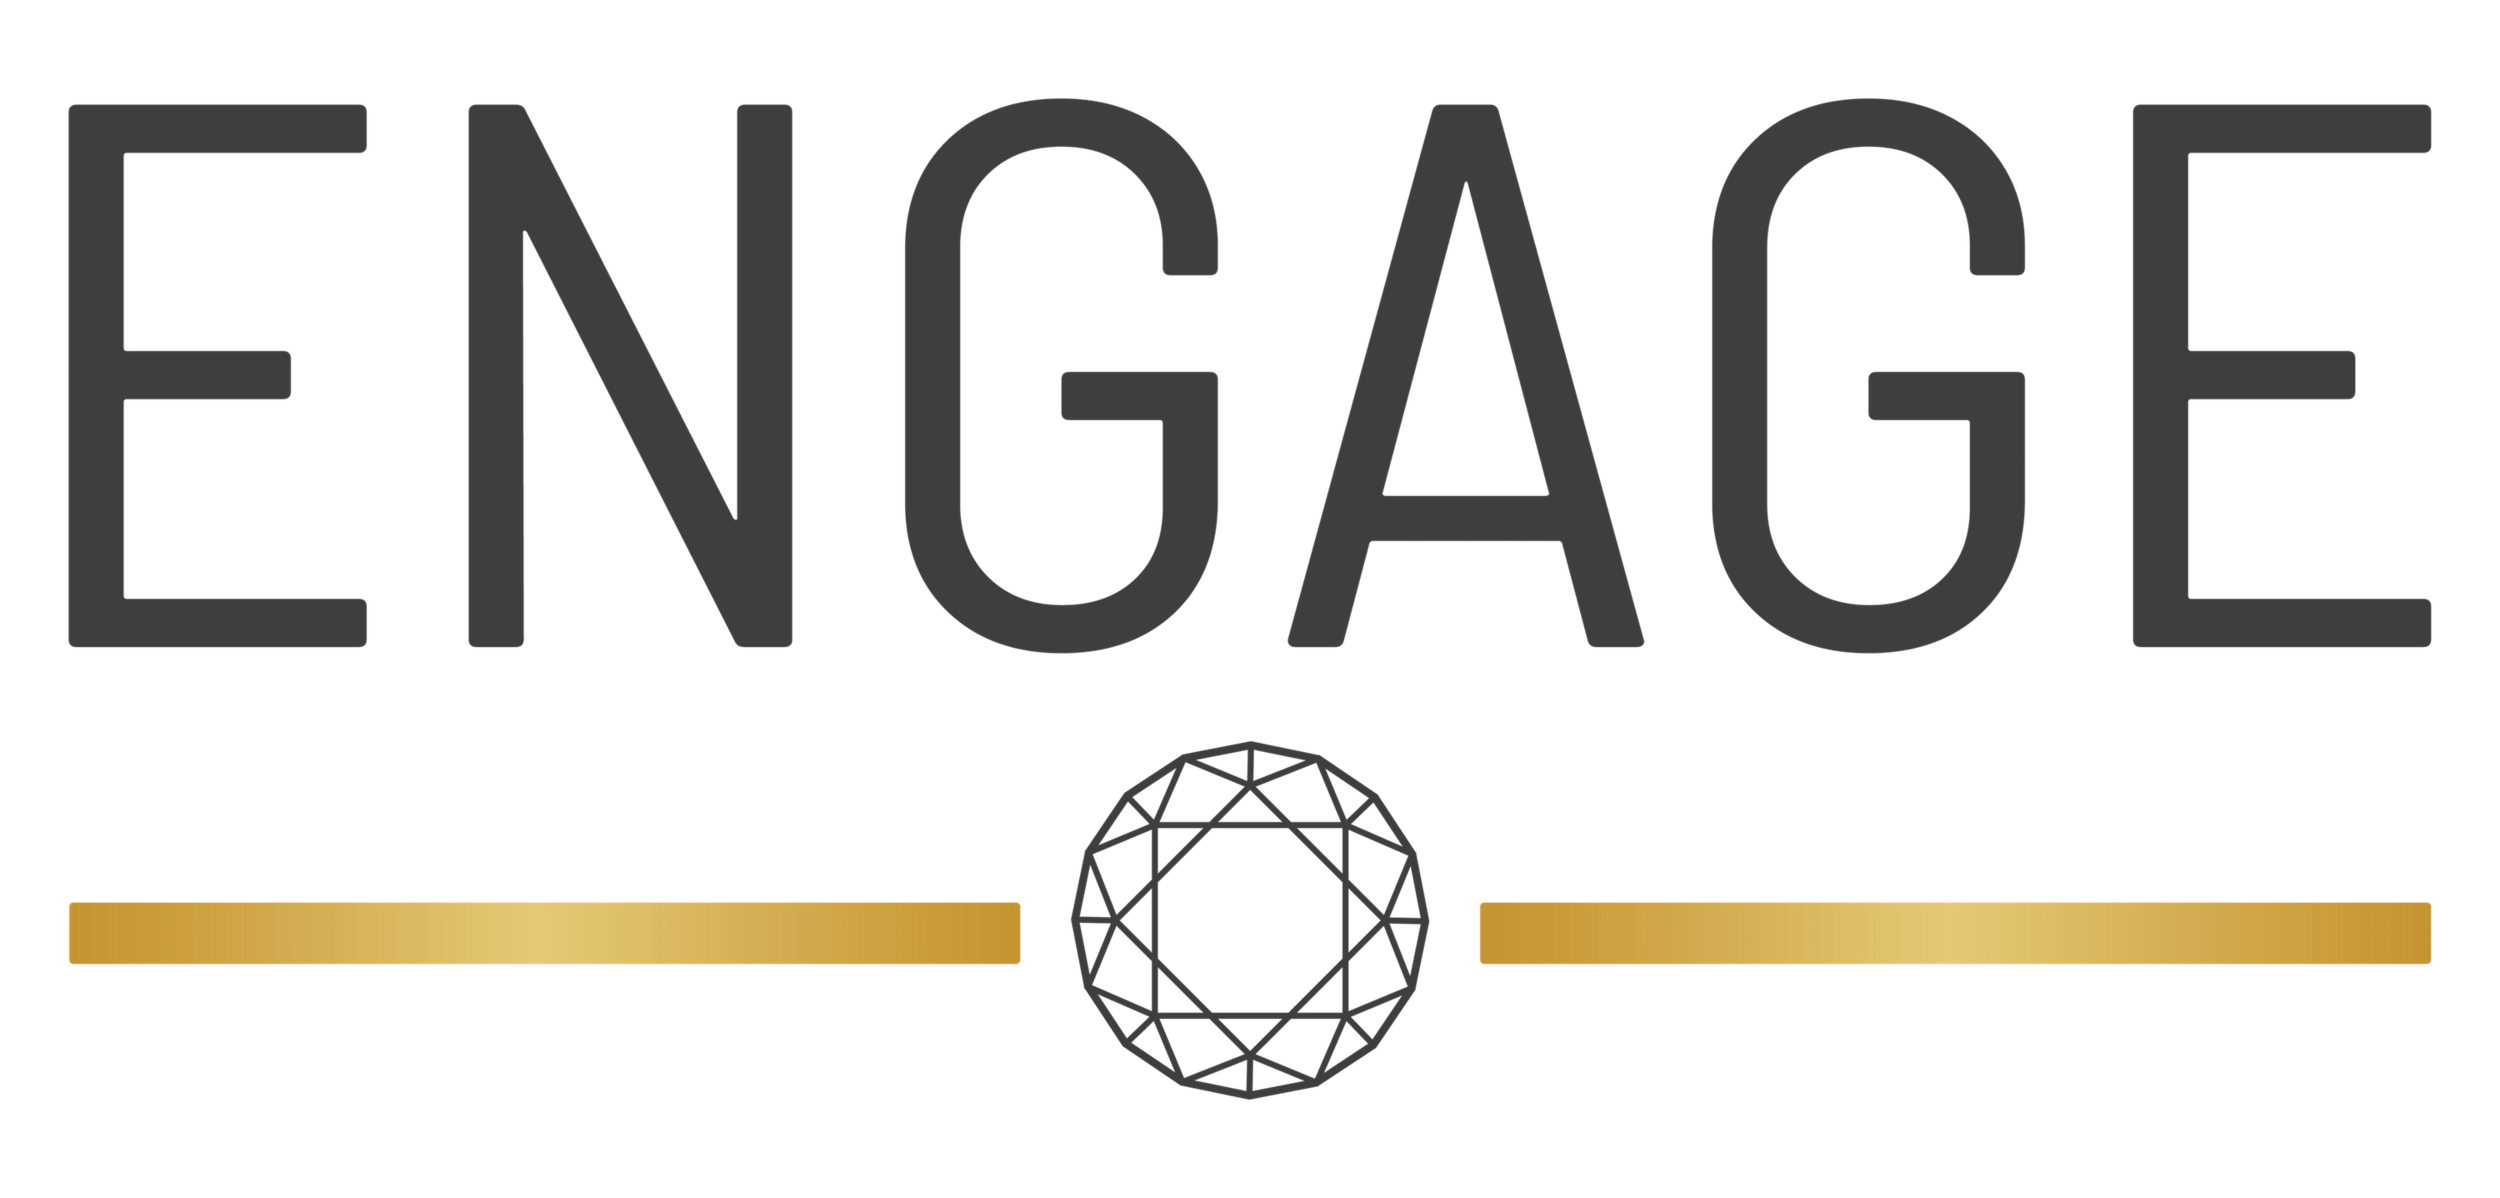 ENG-LOGO-GRAY.png